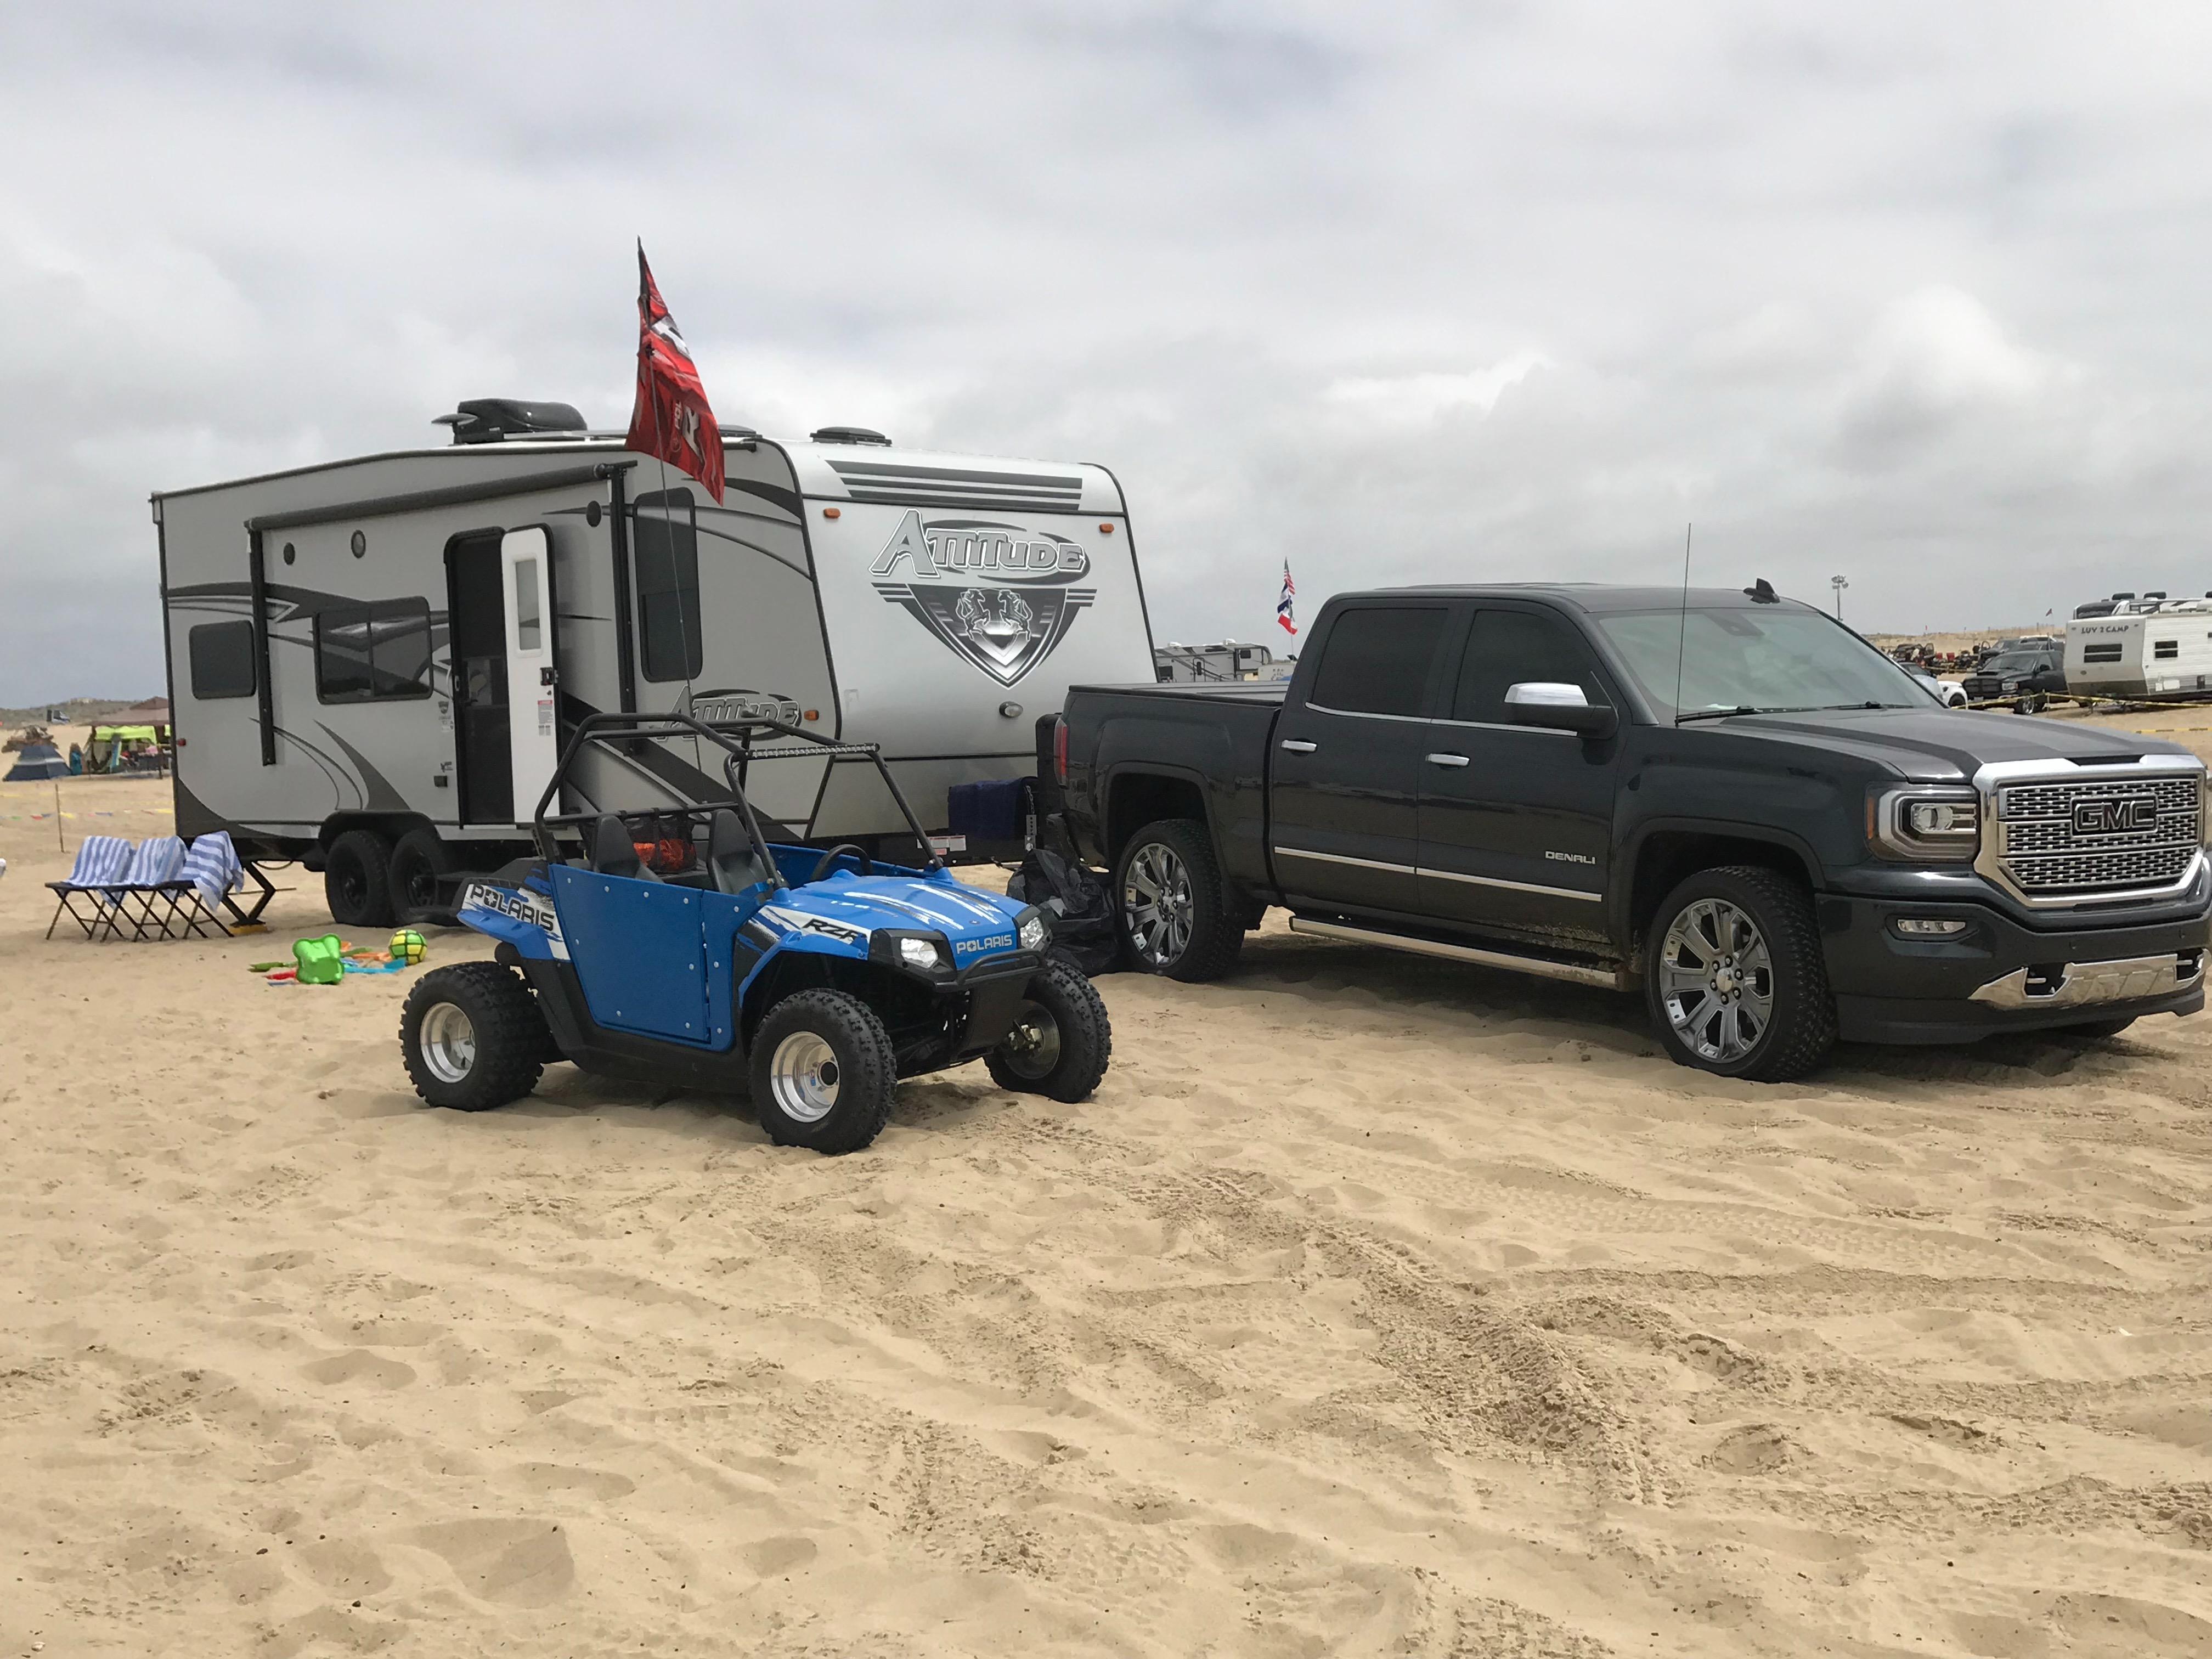 Pismo Beach. Eclipse Recreational Vehicles Attitude 2020